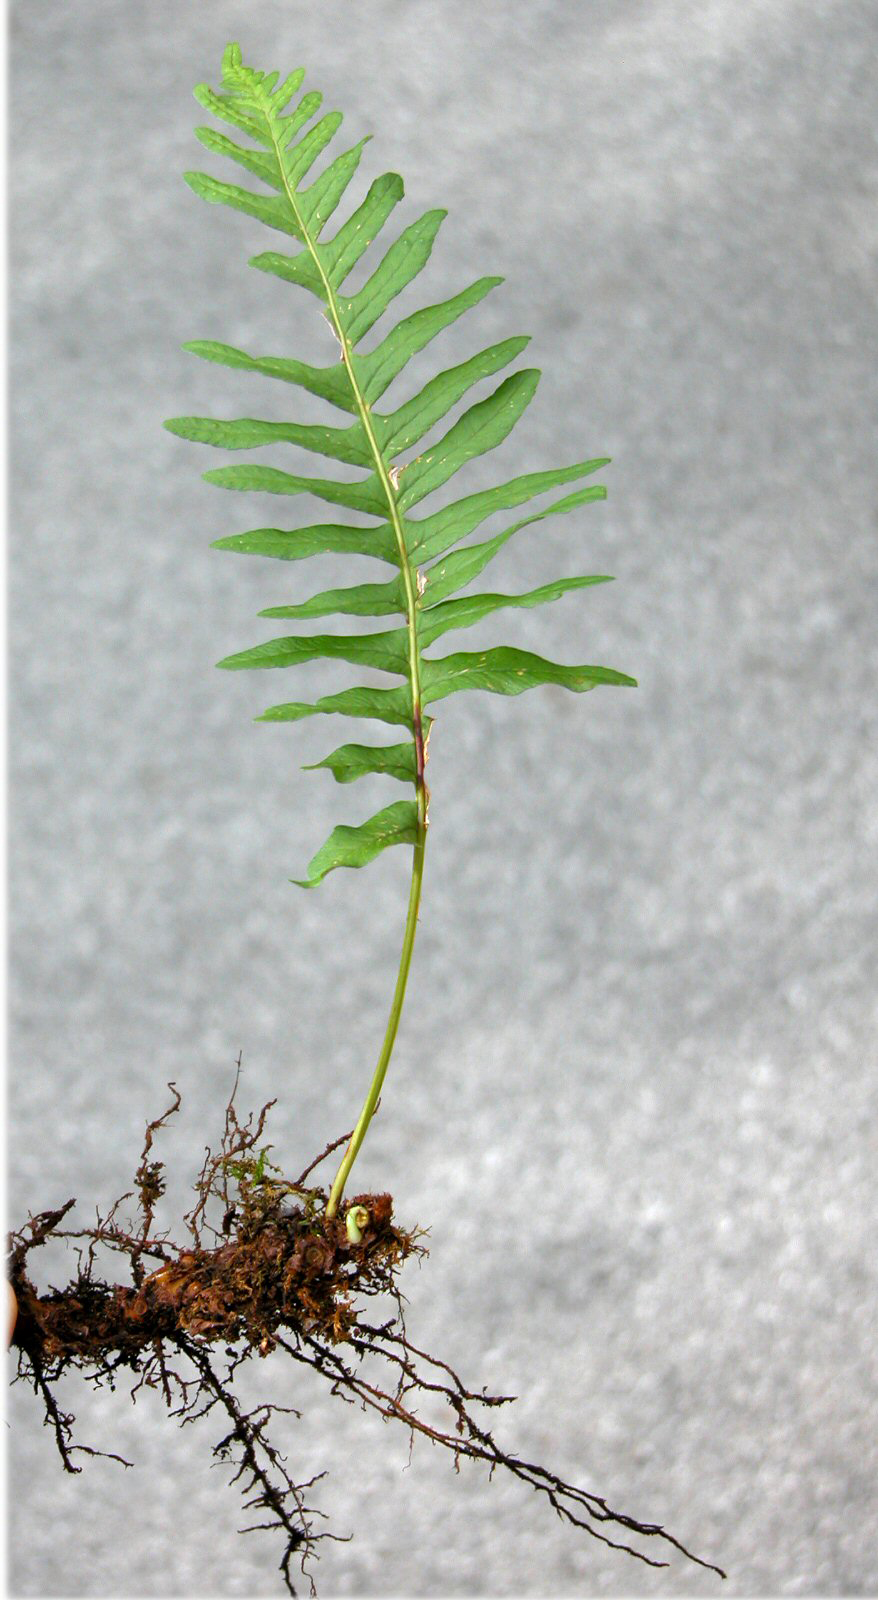 Polybody-whole-plant